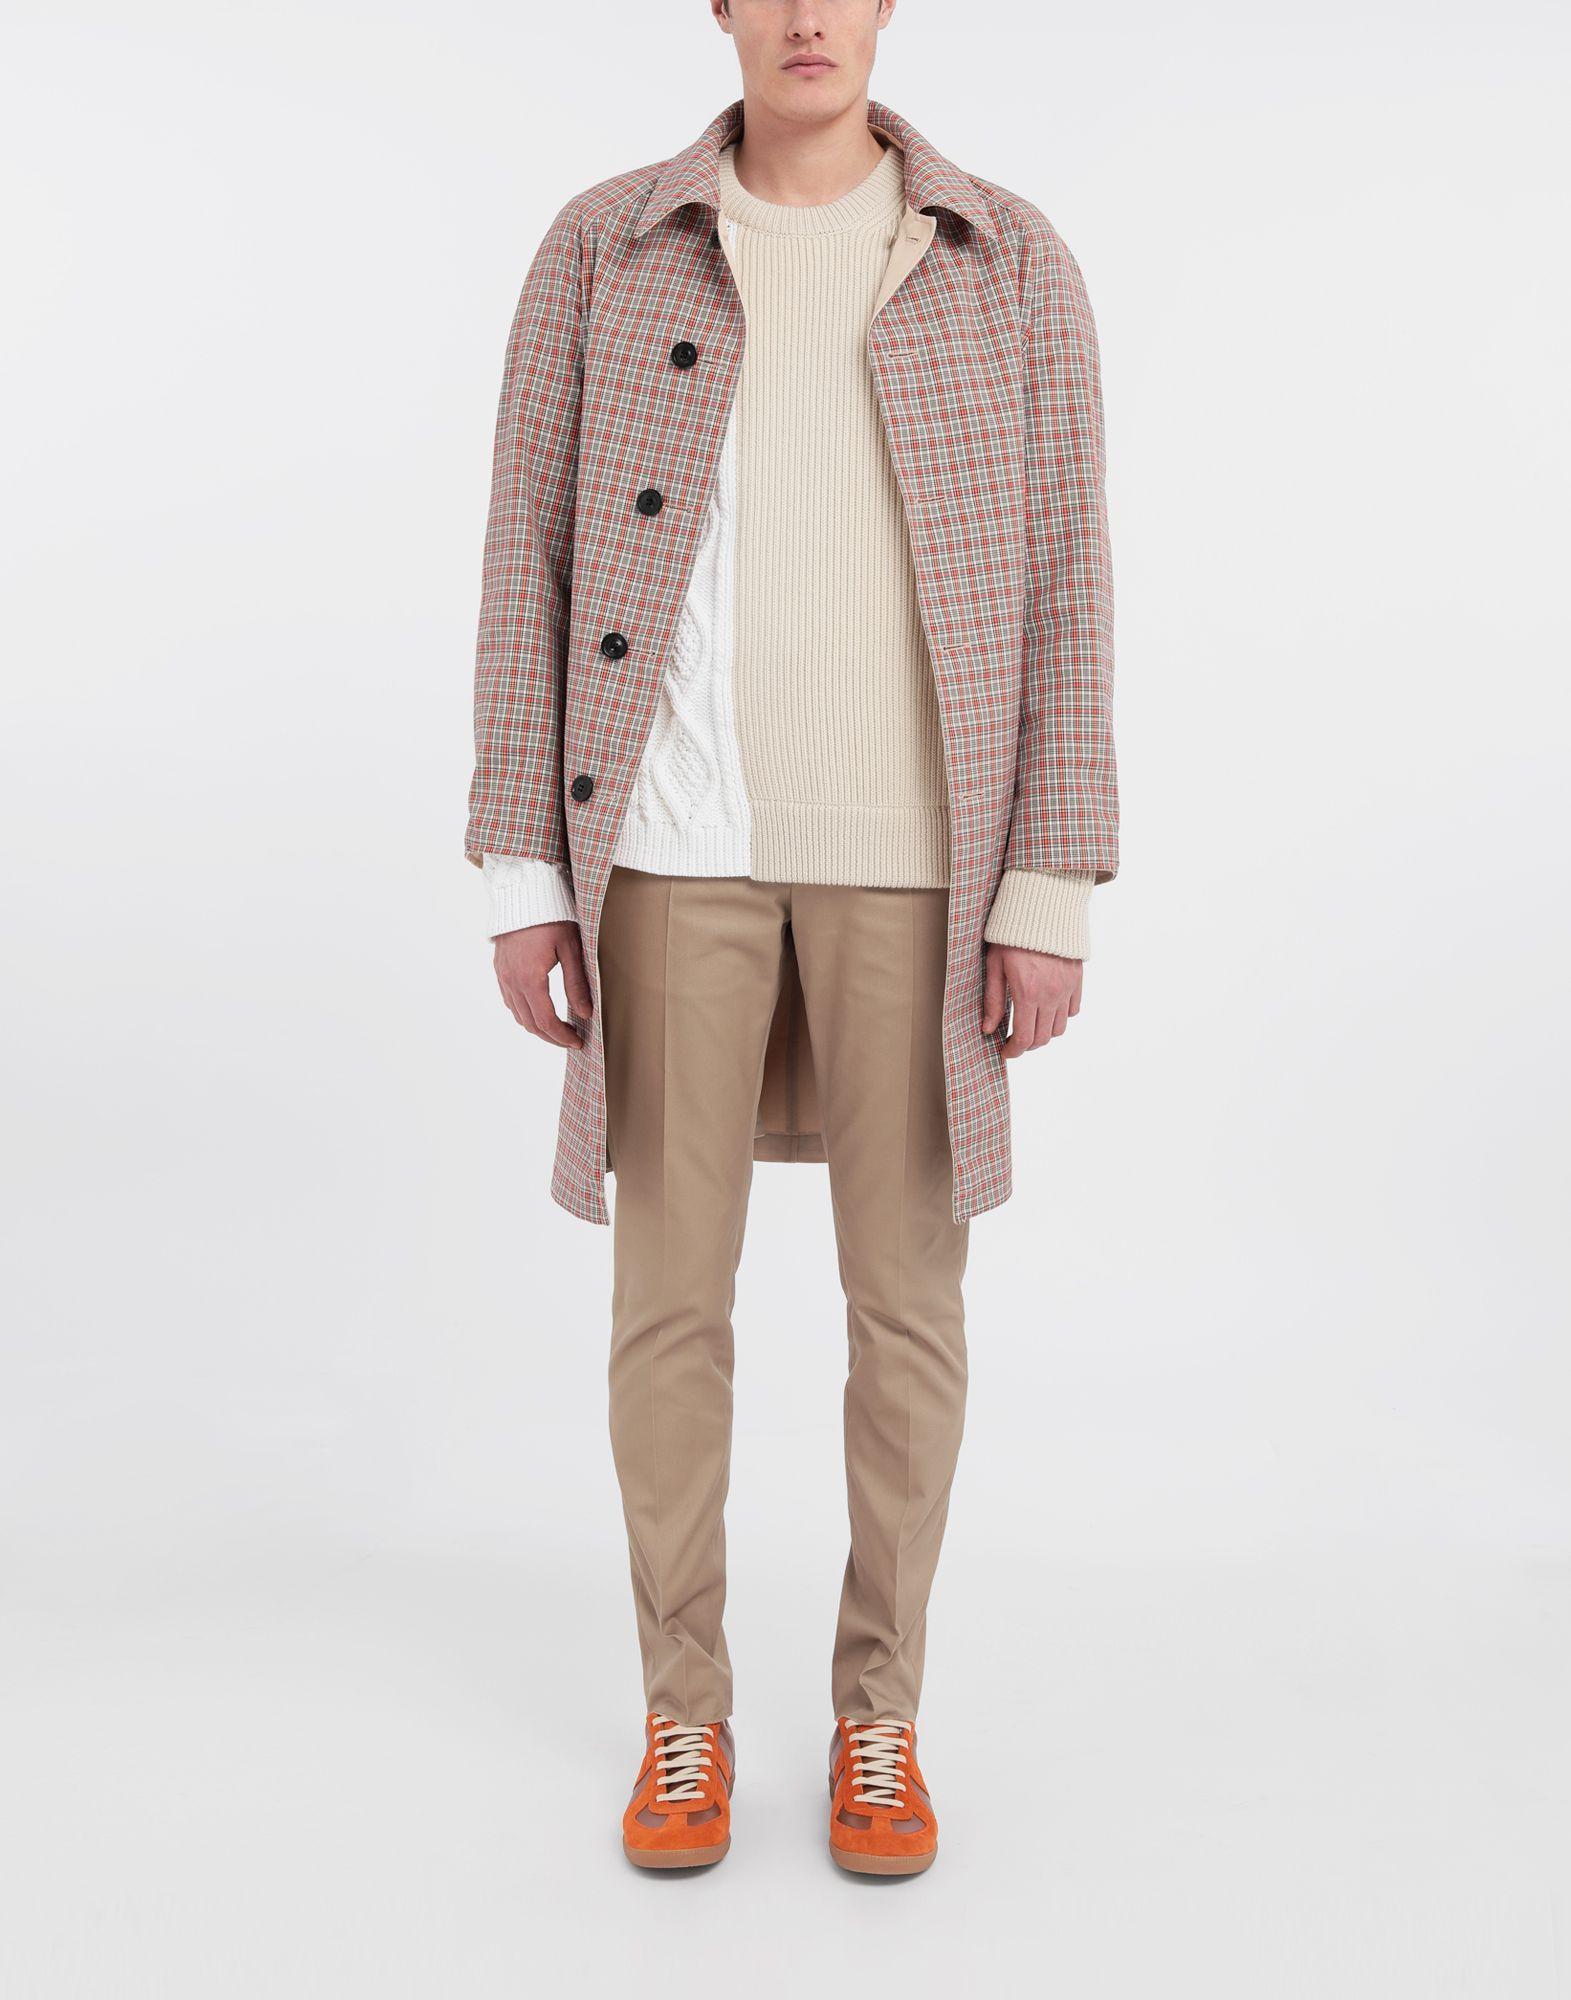 MAISON MARGIELA Spliced knit pullover Crewneck sweater Man d